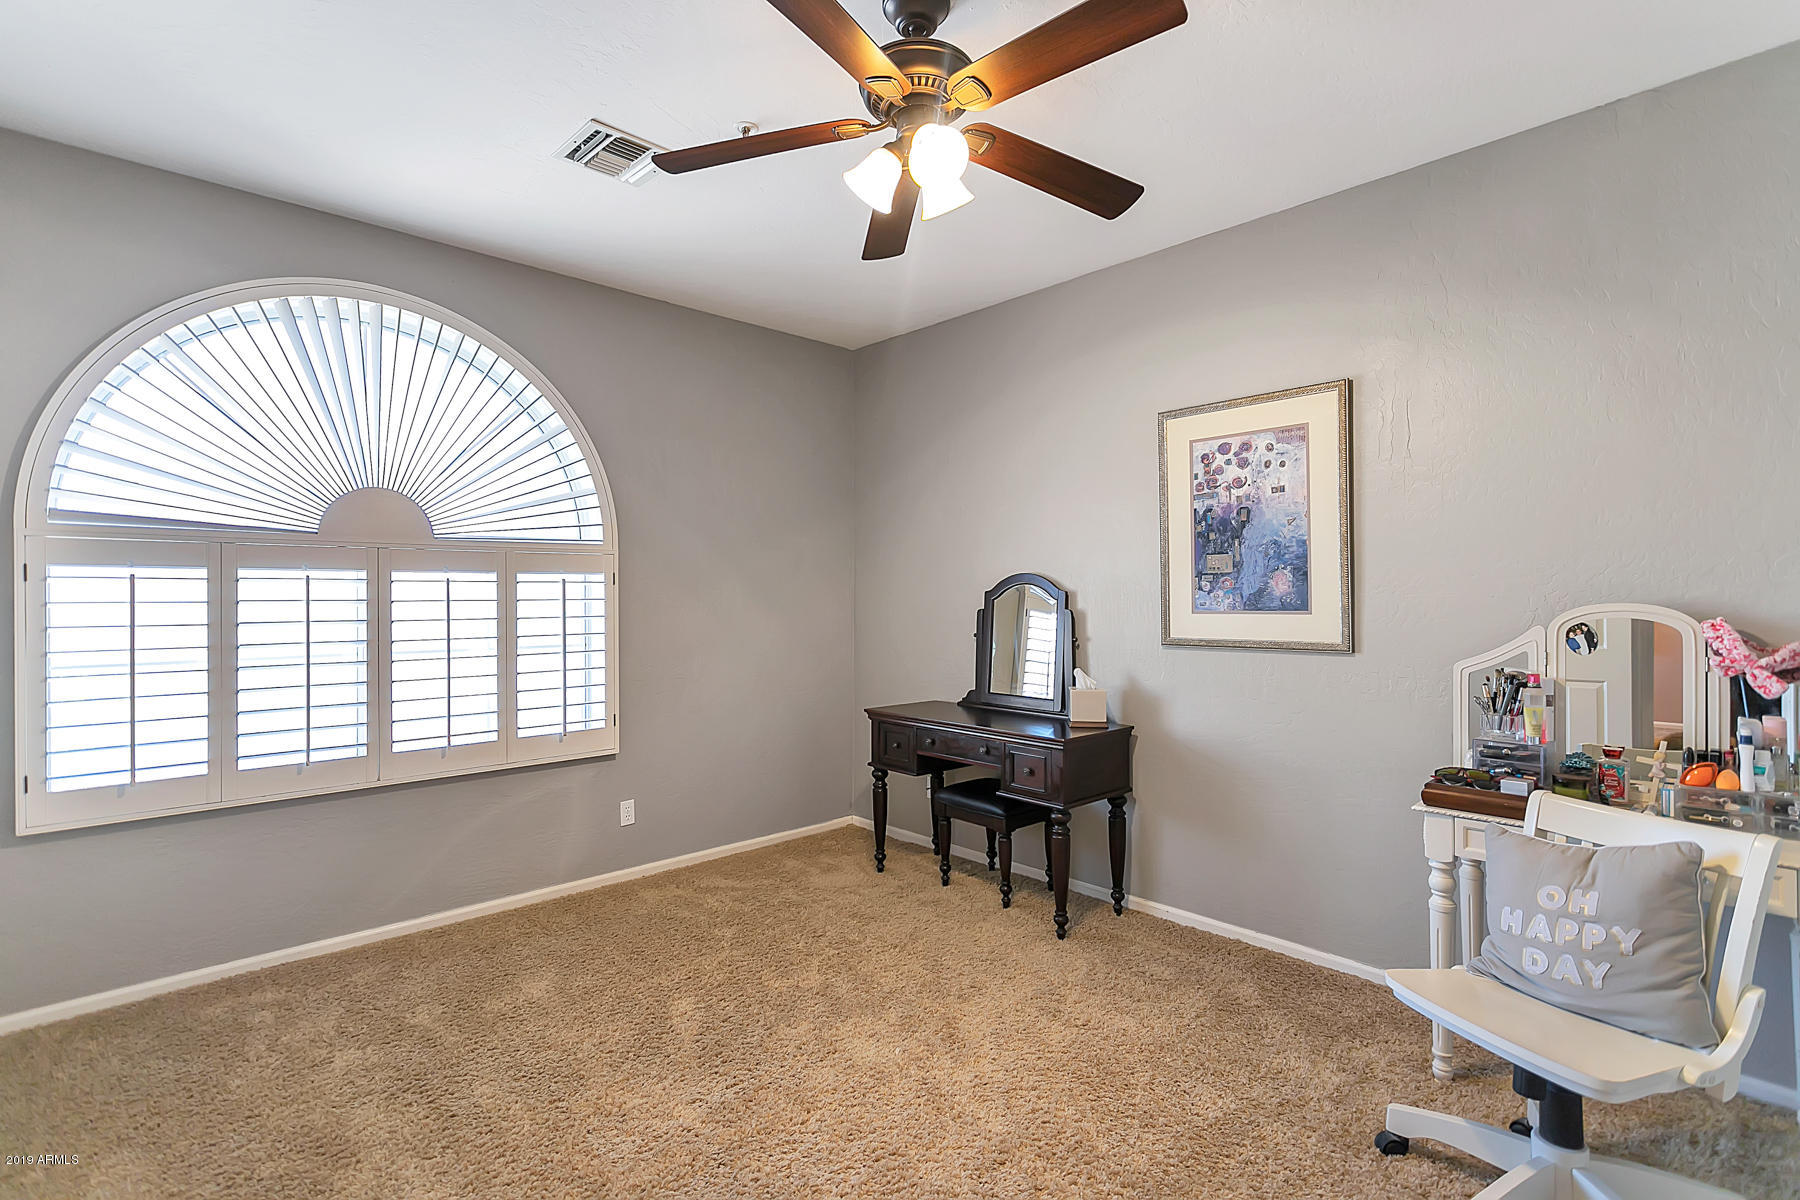 MLS 5972546 13098 E YUCCA Street, Scottsdale, AZ 85259 Scottsdale AZ Private Pool